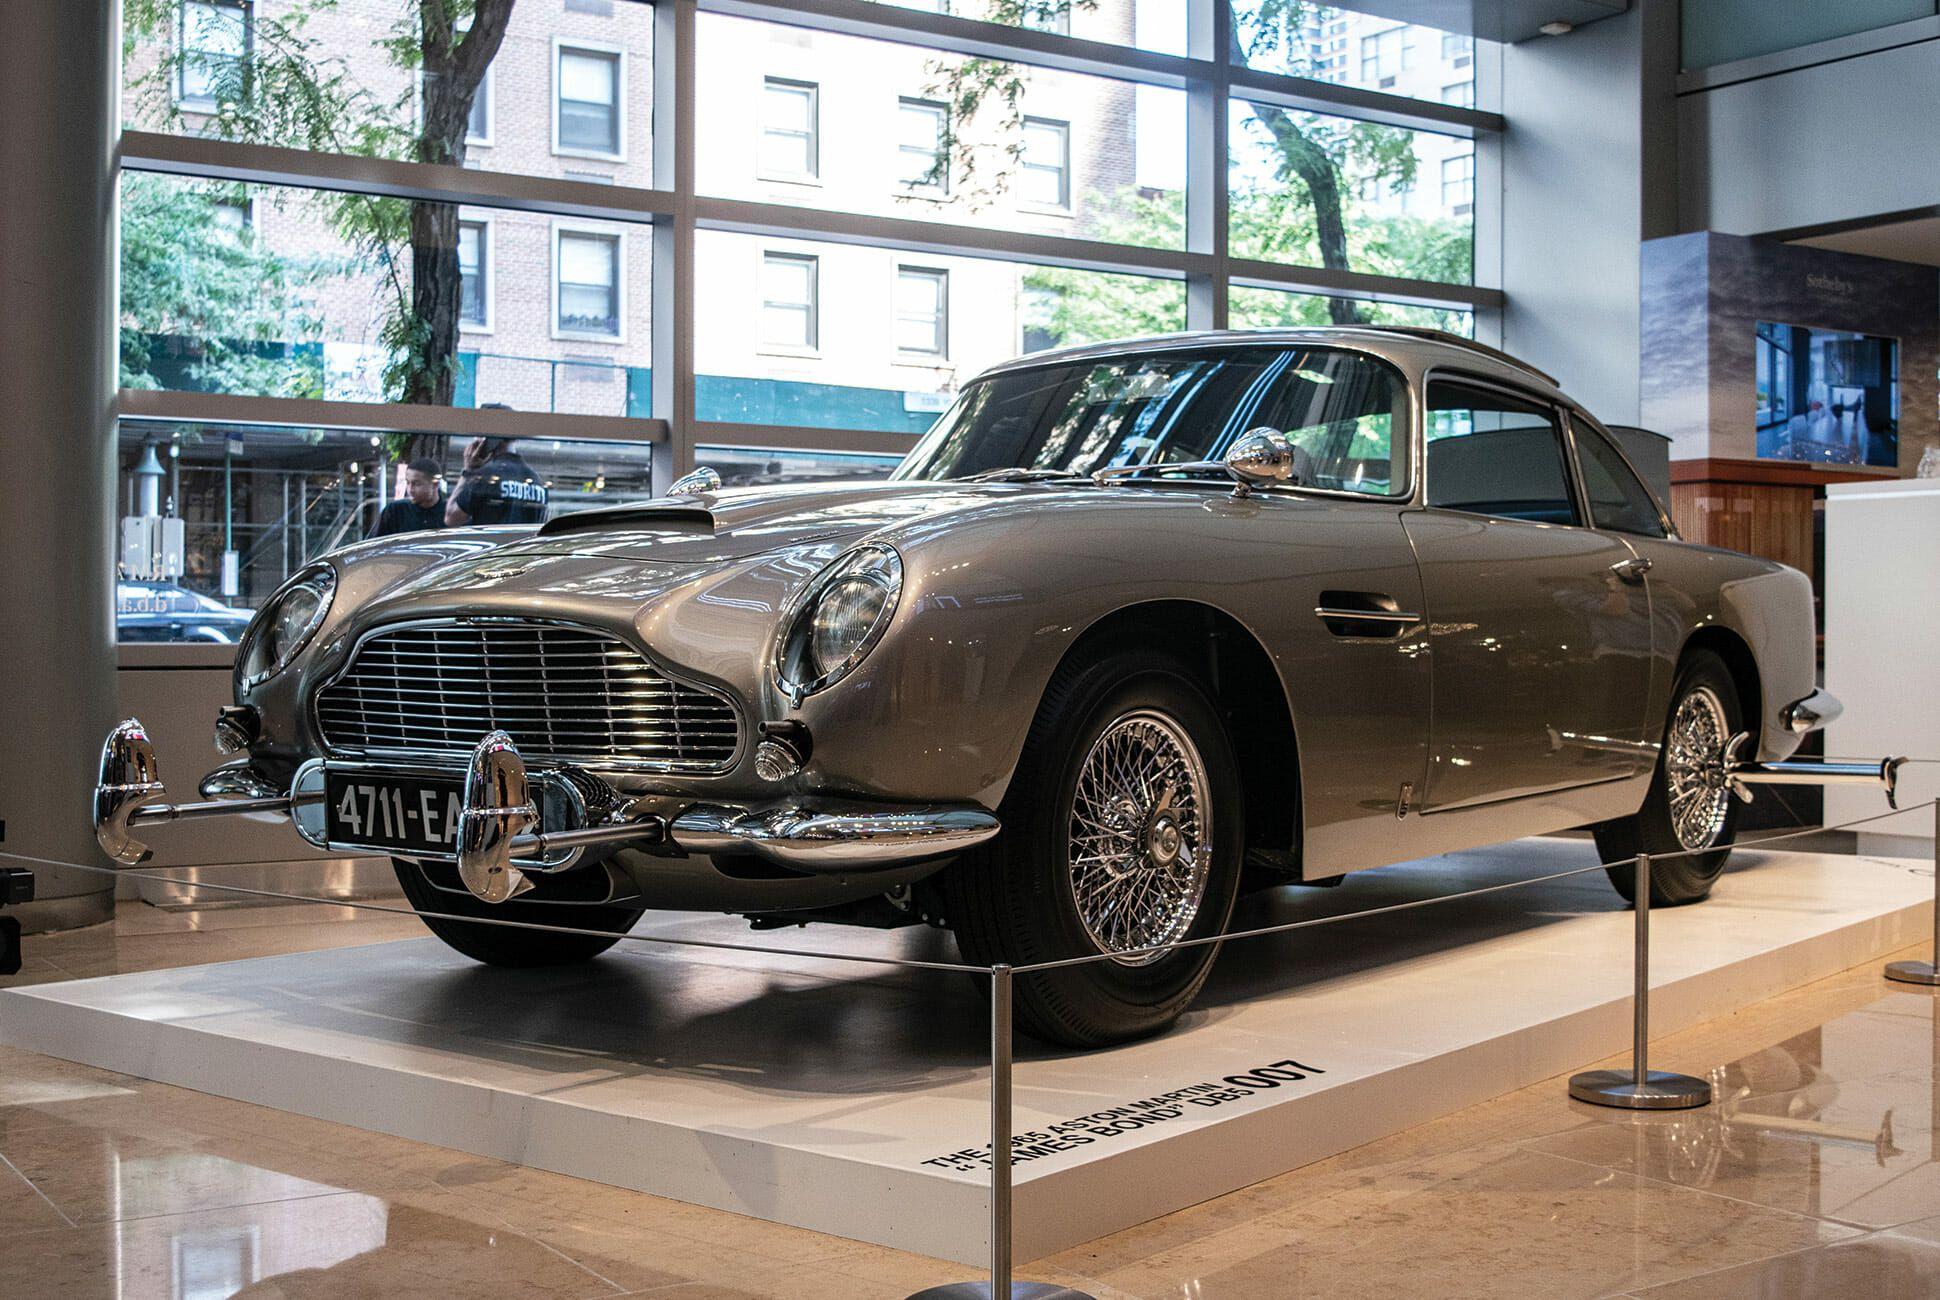 James-Bond-Aston-Martin-DB5-gear-patrol-slide-1